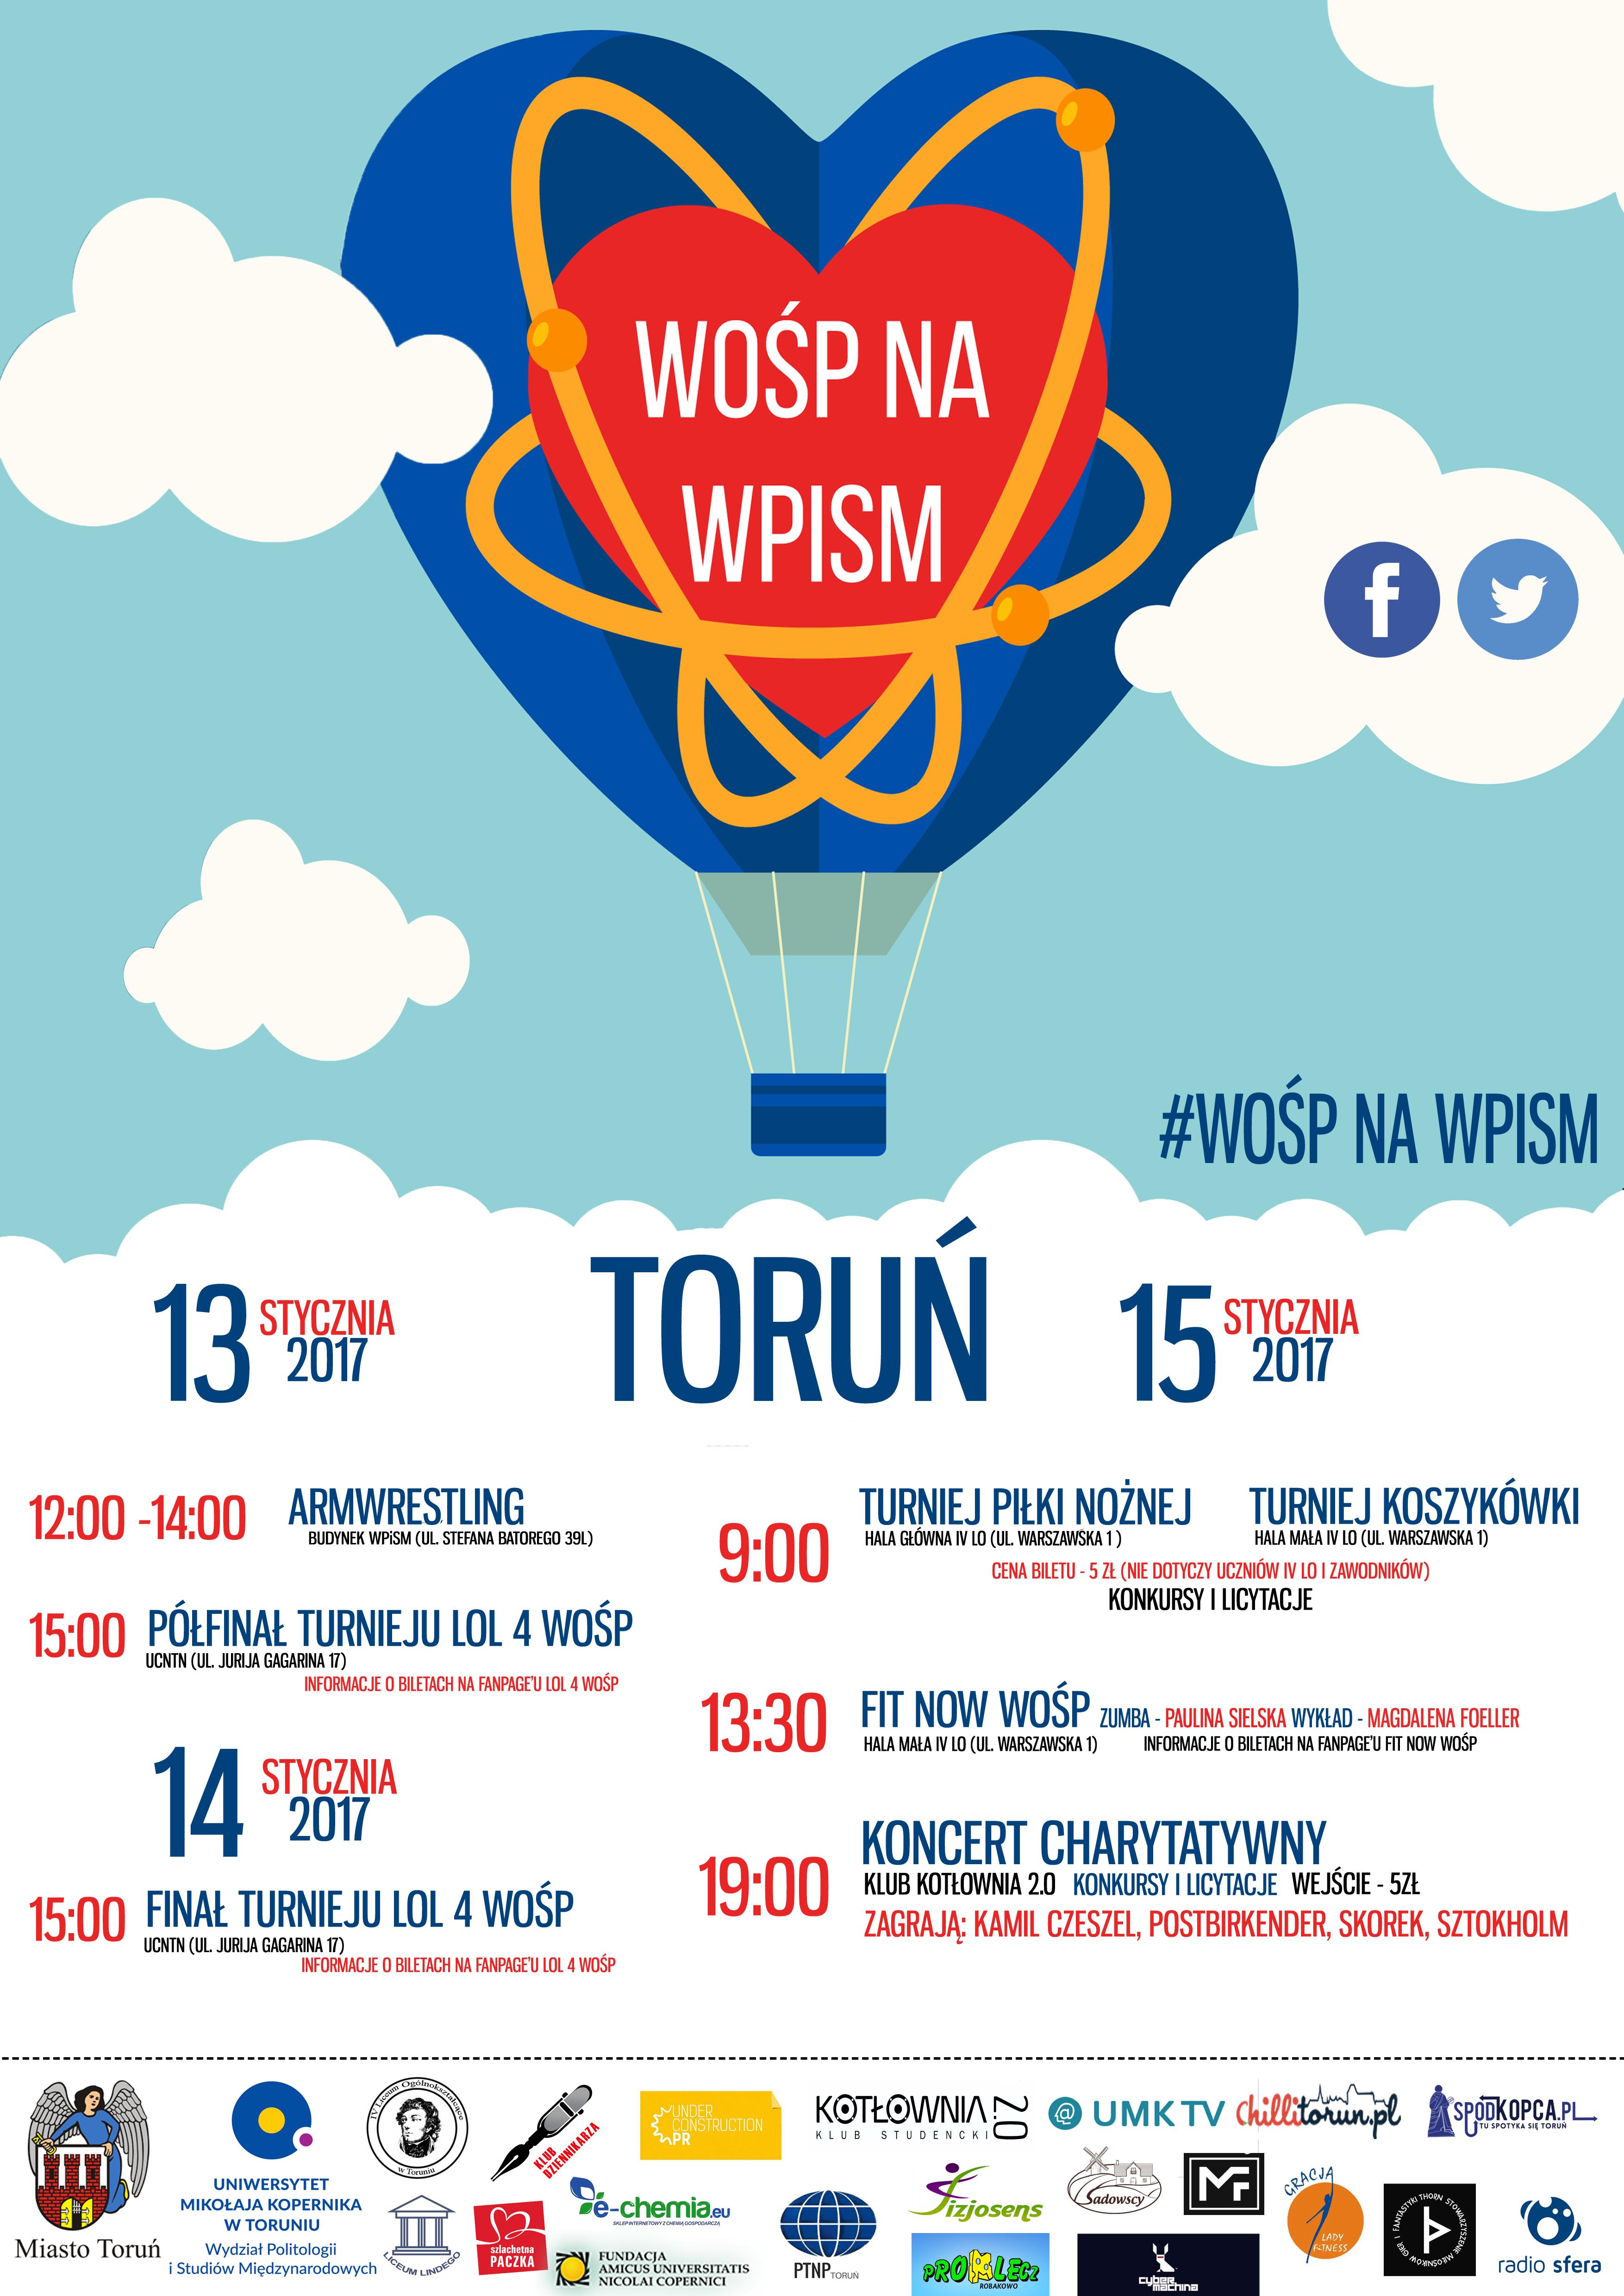 plakat_wosp_na_wpism_2017